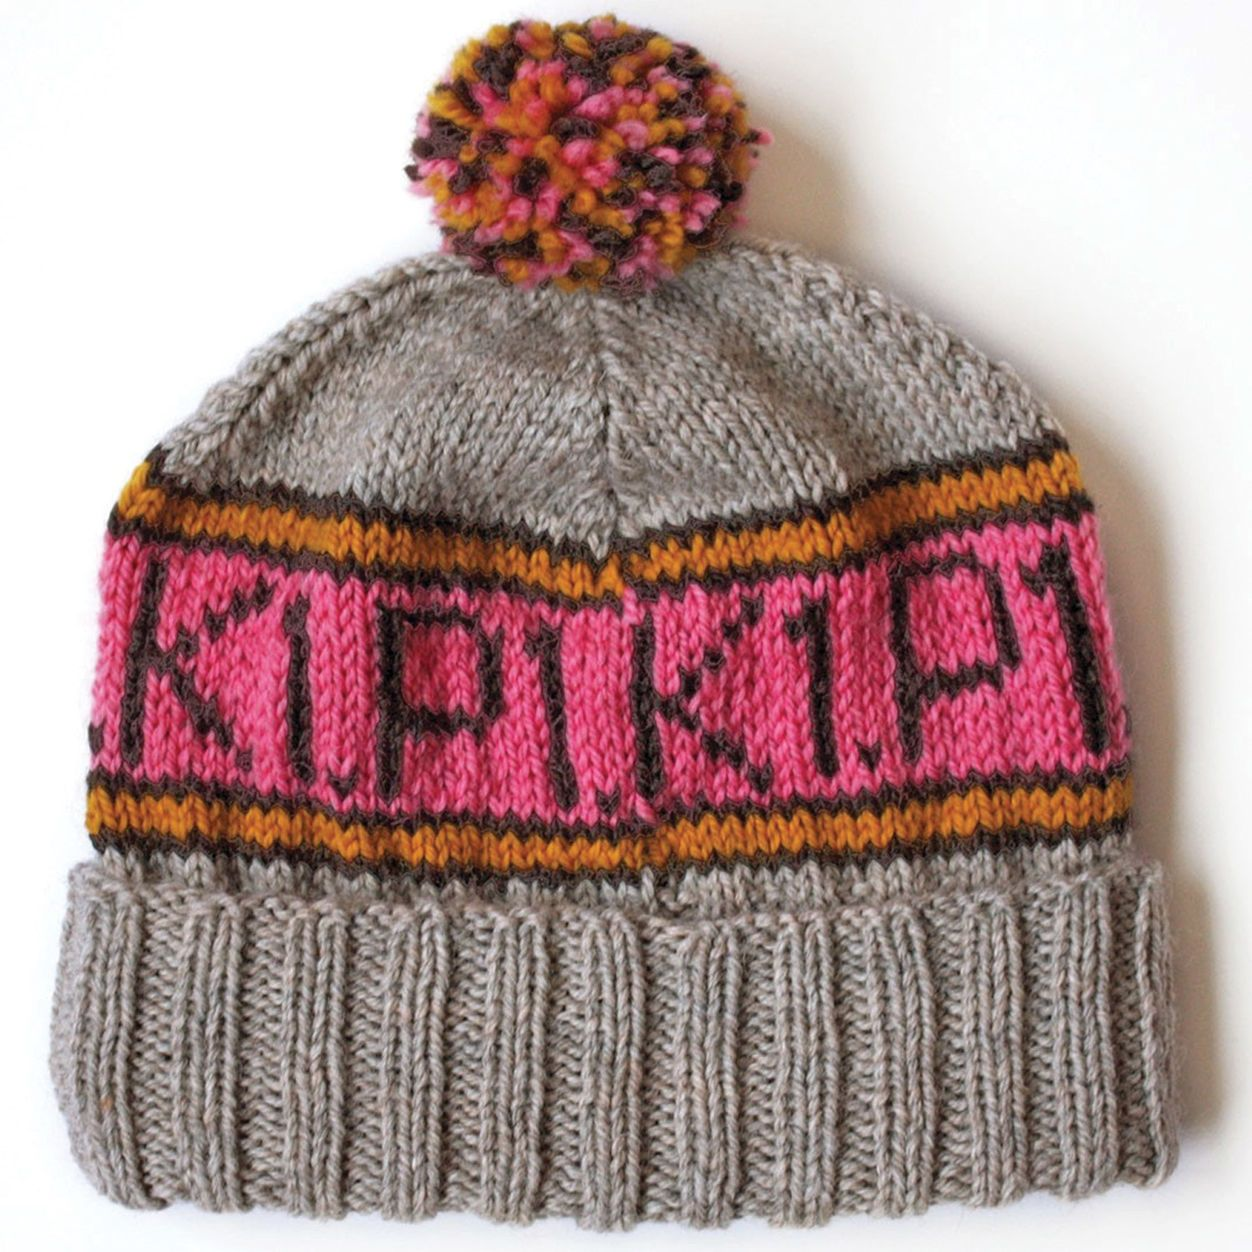 Patons K1. P1. Toque | Knitting, Knitting patterns ...